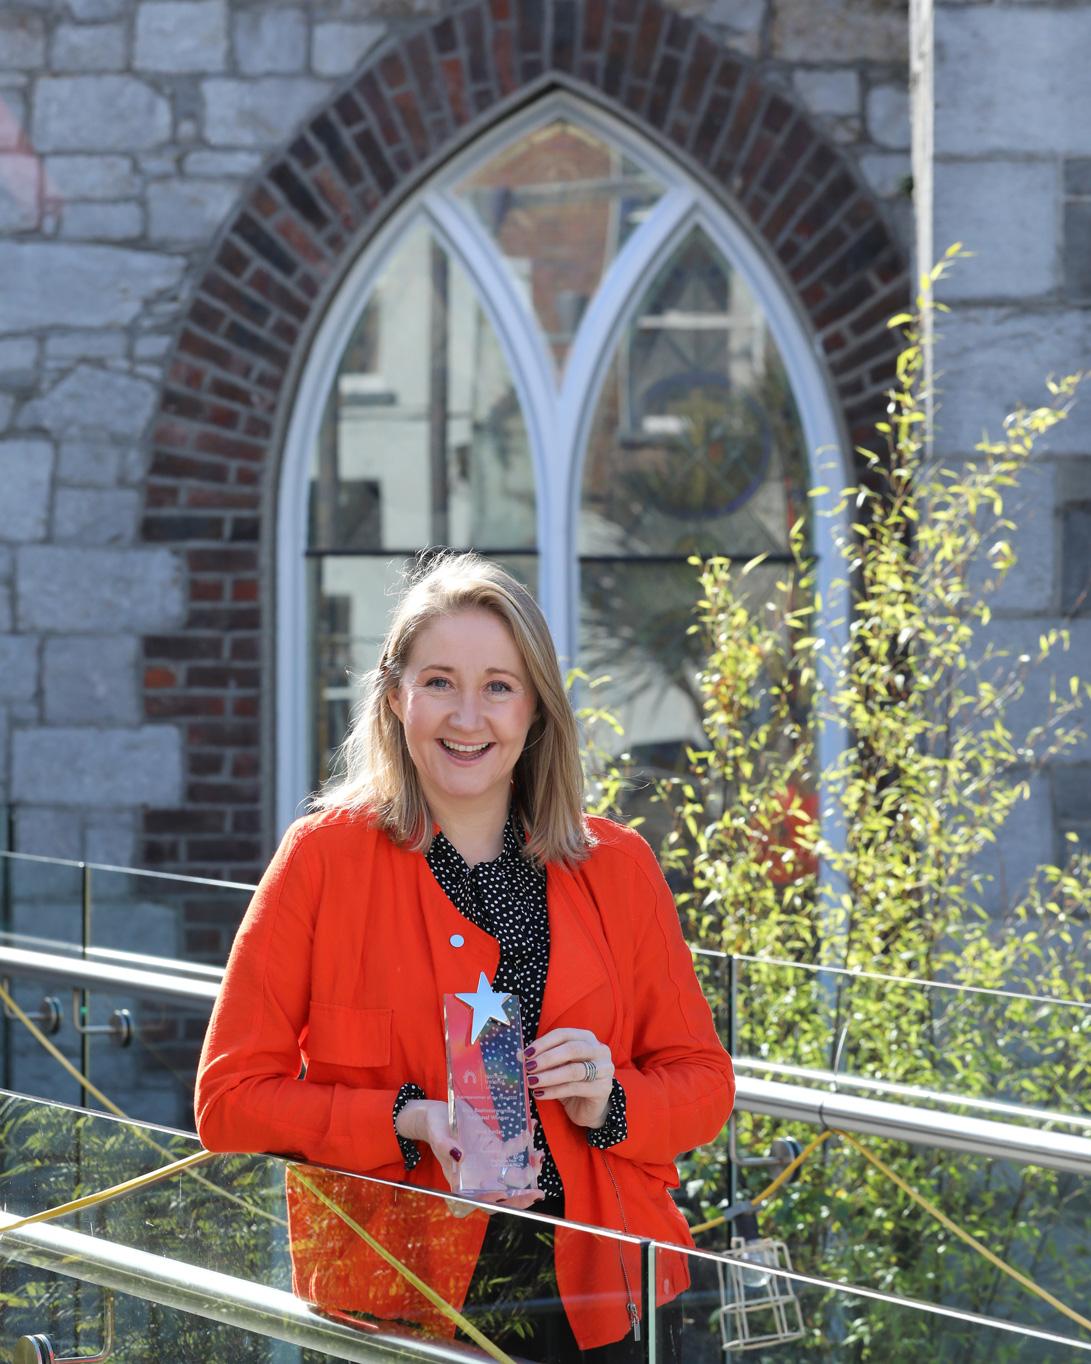 Network Ireland Louth Awards 2020, Jenny Callanan Photography, Drogheda, Co.Louth